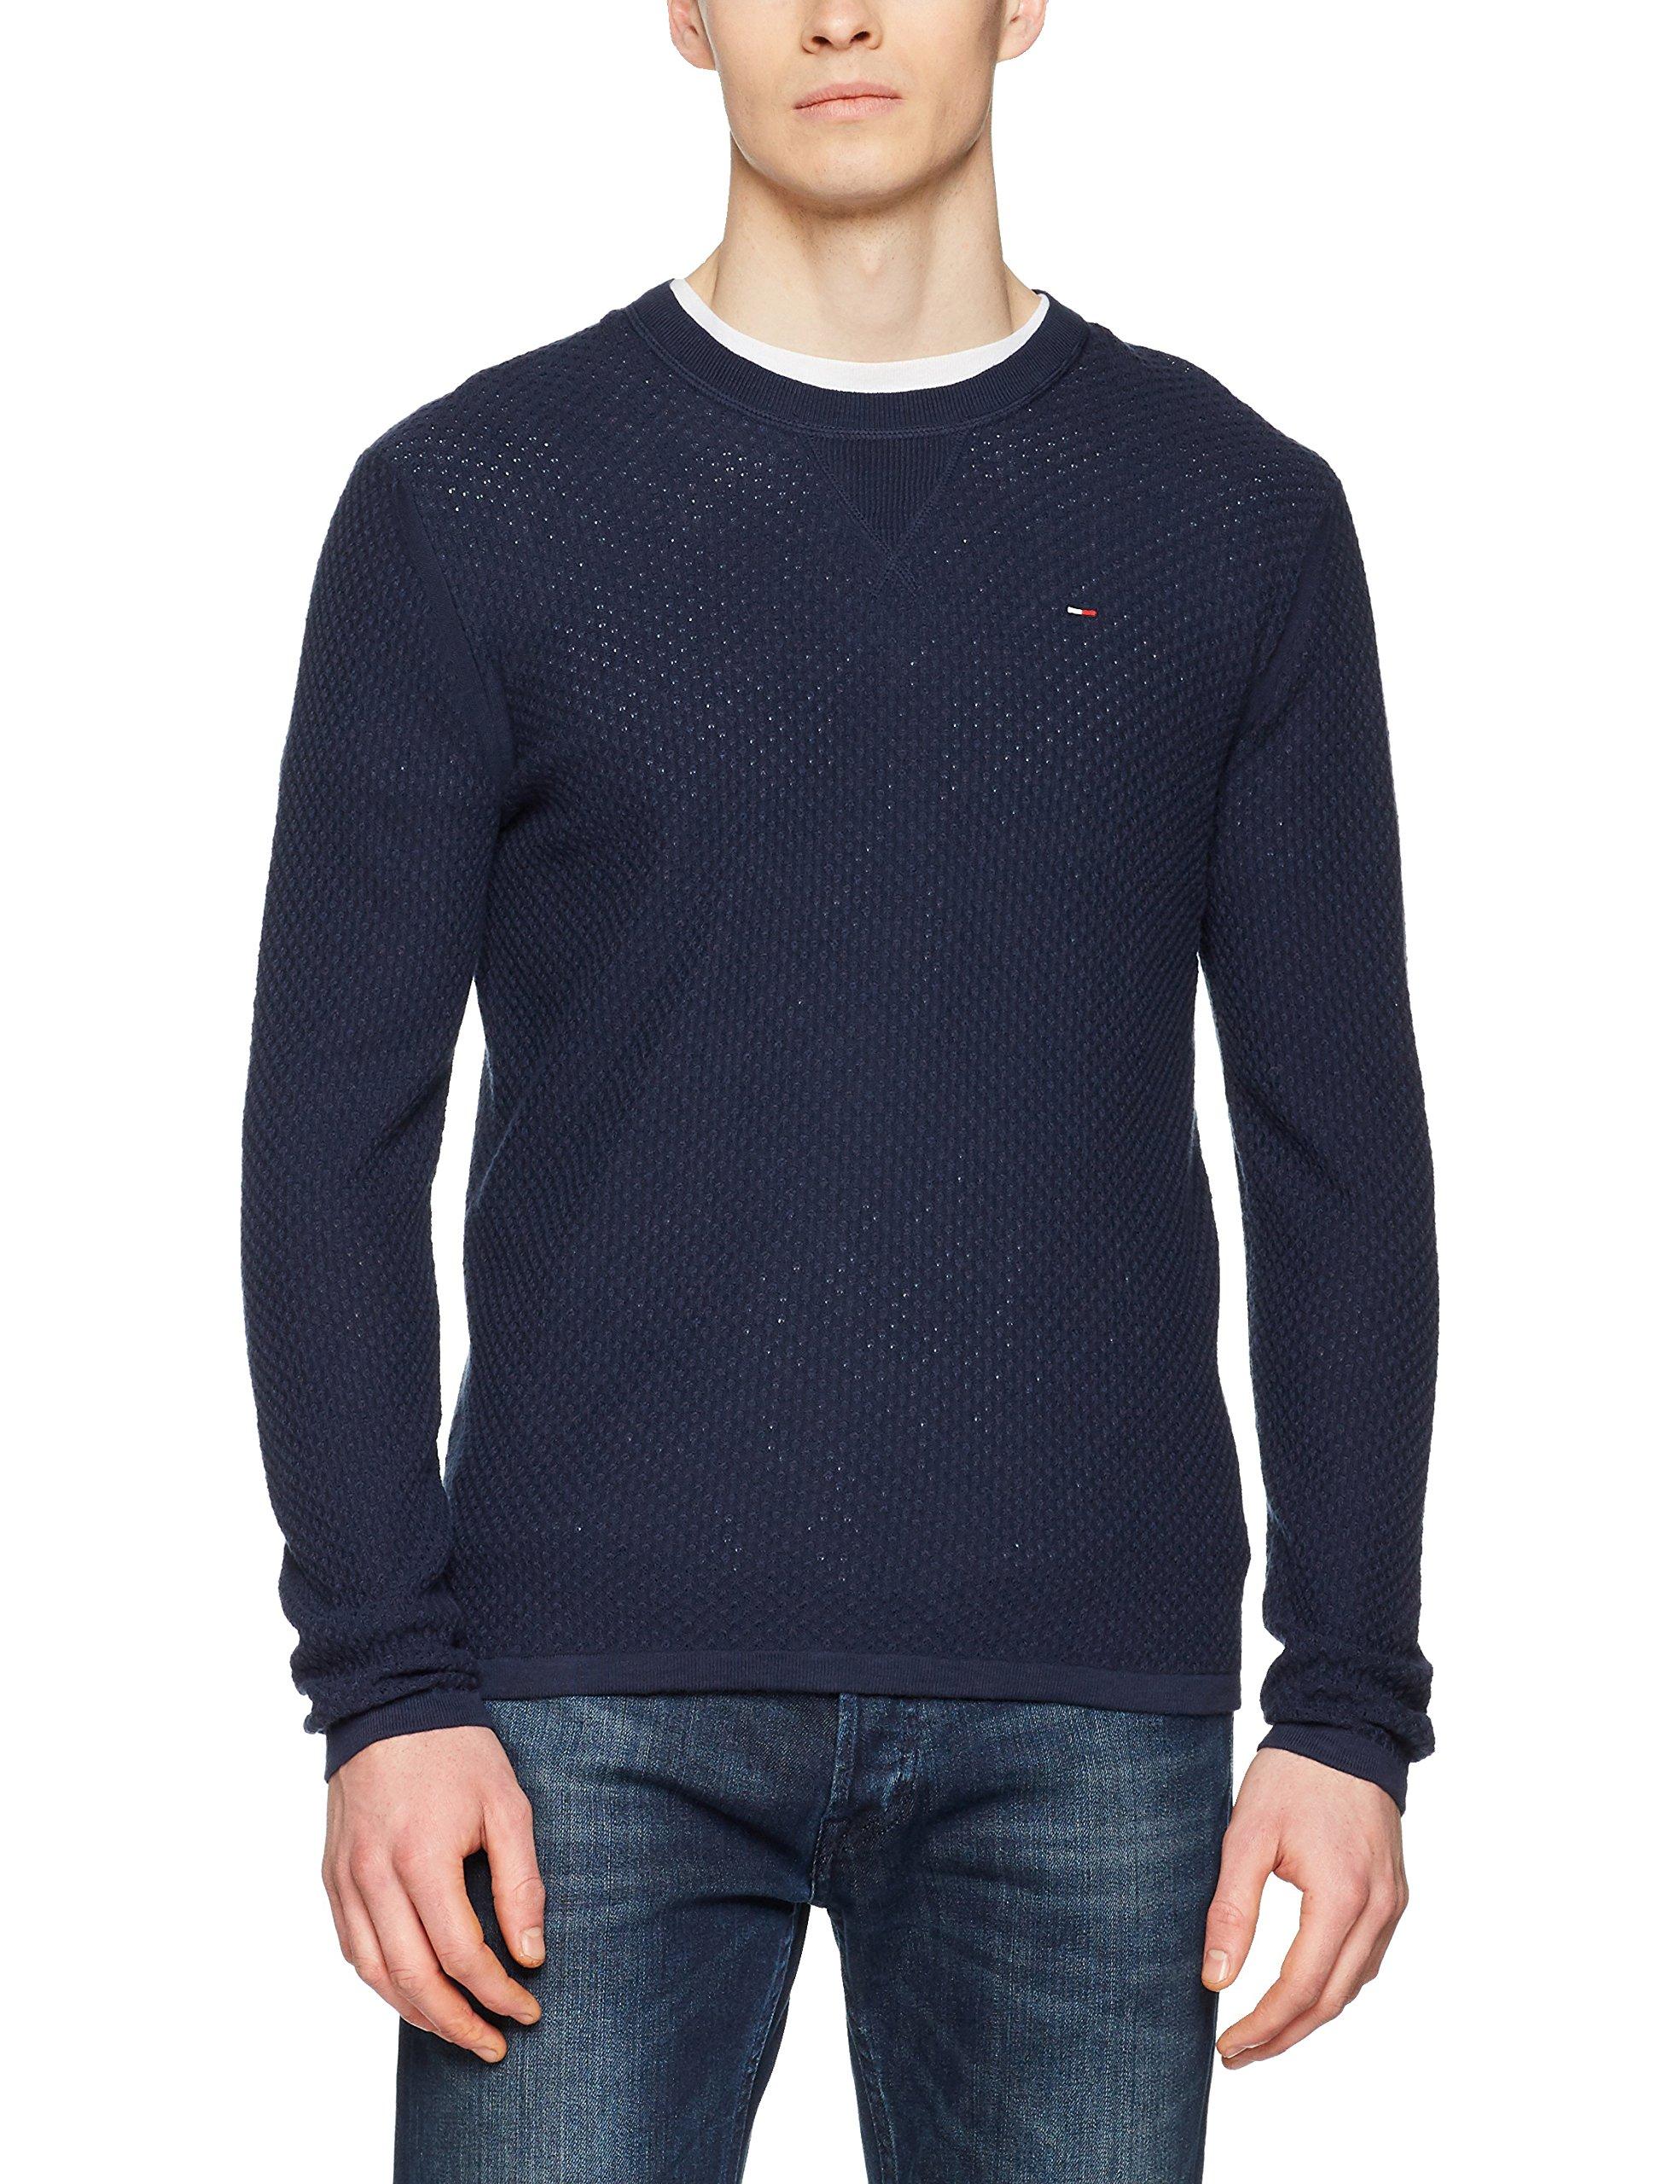 Jeans Courtes Essential Pull Tommy Iris Homme Bleublack 002Large Manches Sweater qSzpUVGM